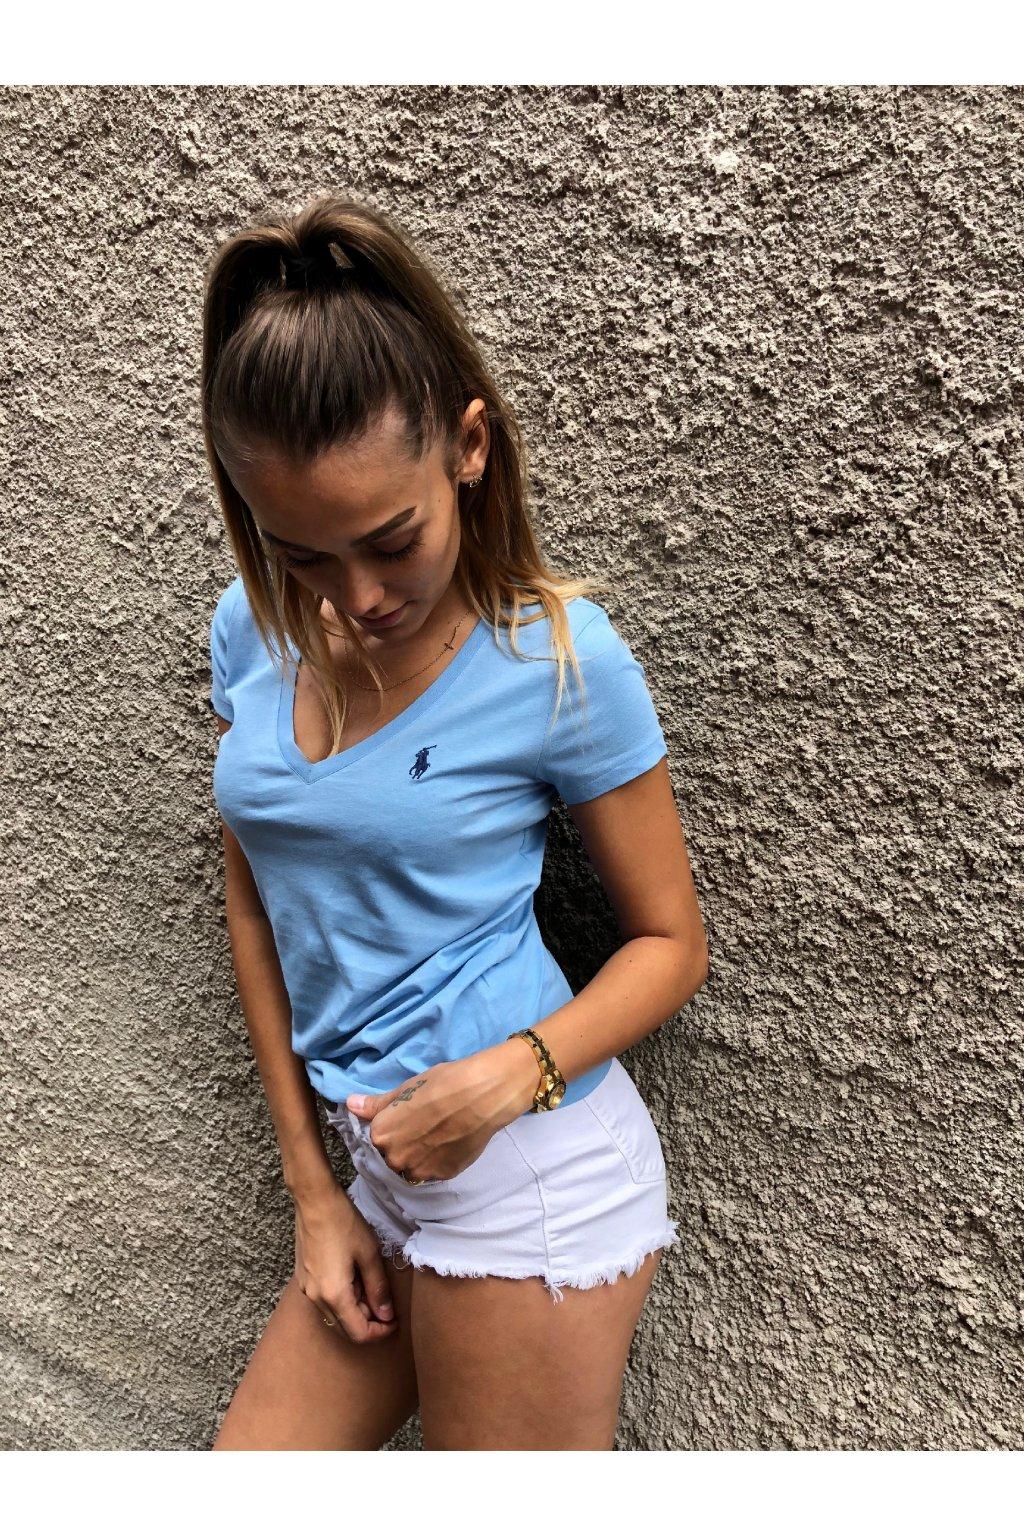 damske tricko ralph lauren basic vneck blue eshopat cz 2